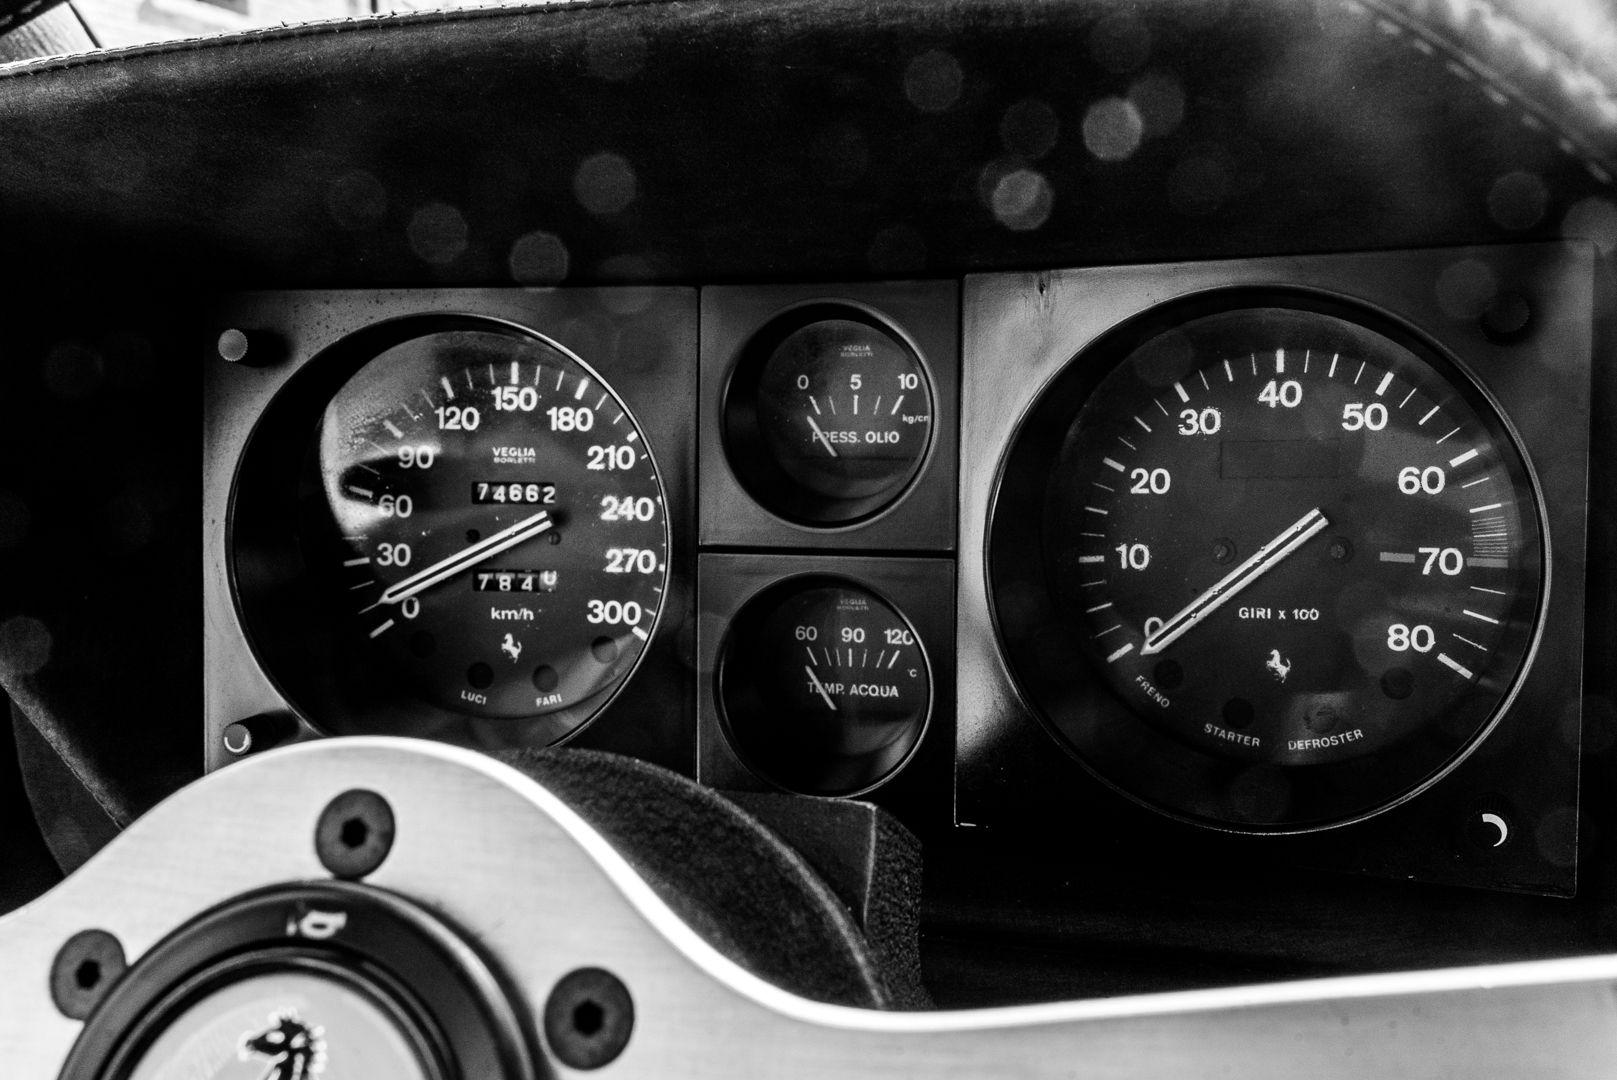 1973 Ferrari 365 GT4 2+2 66443